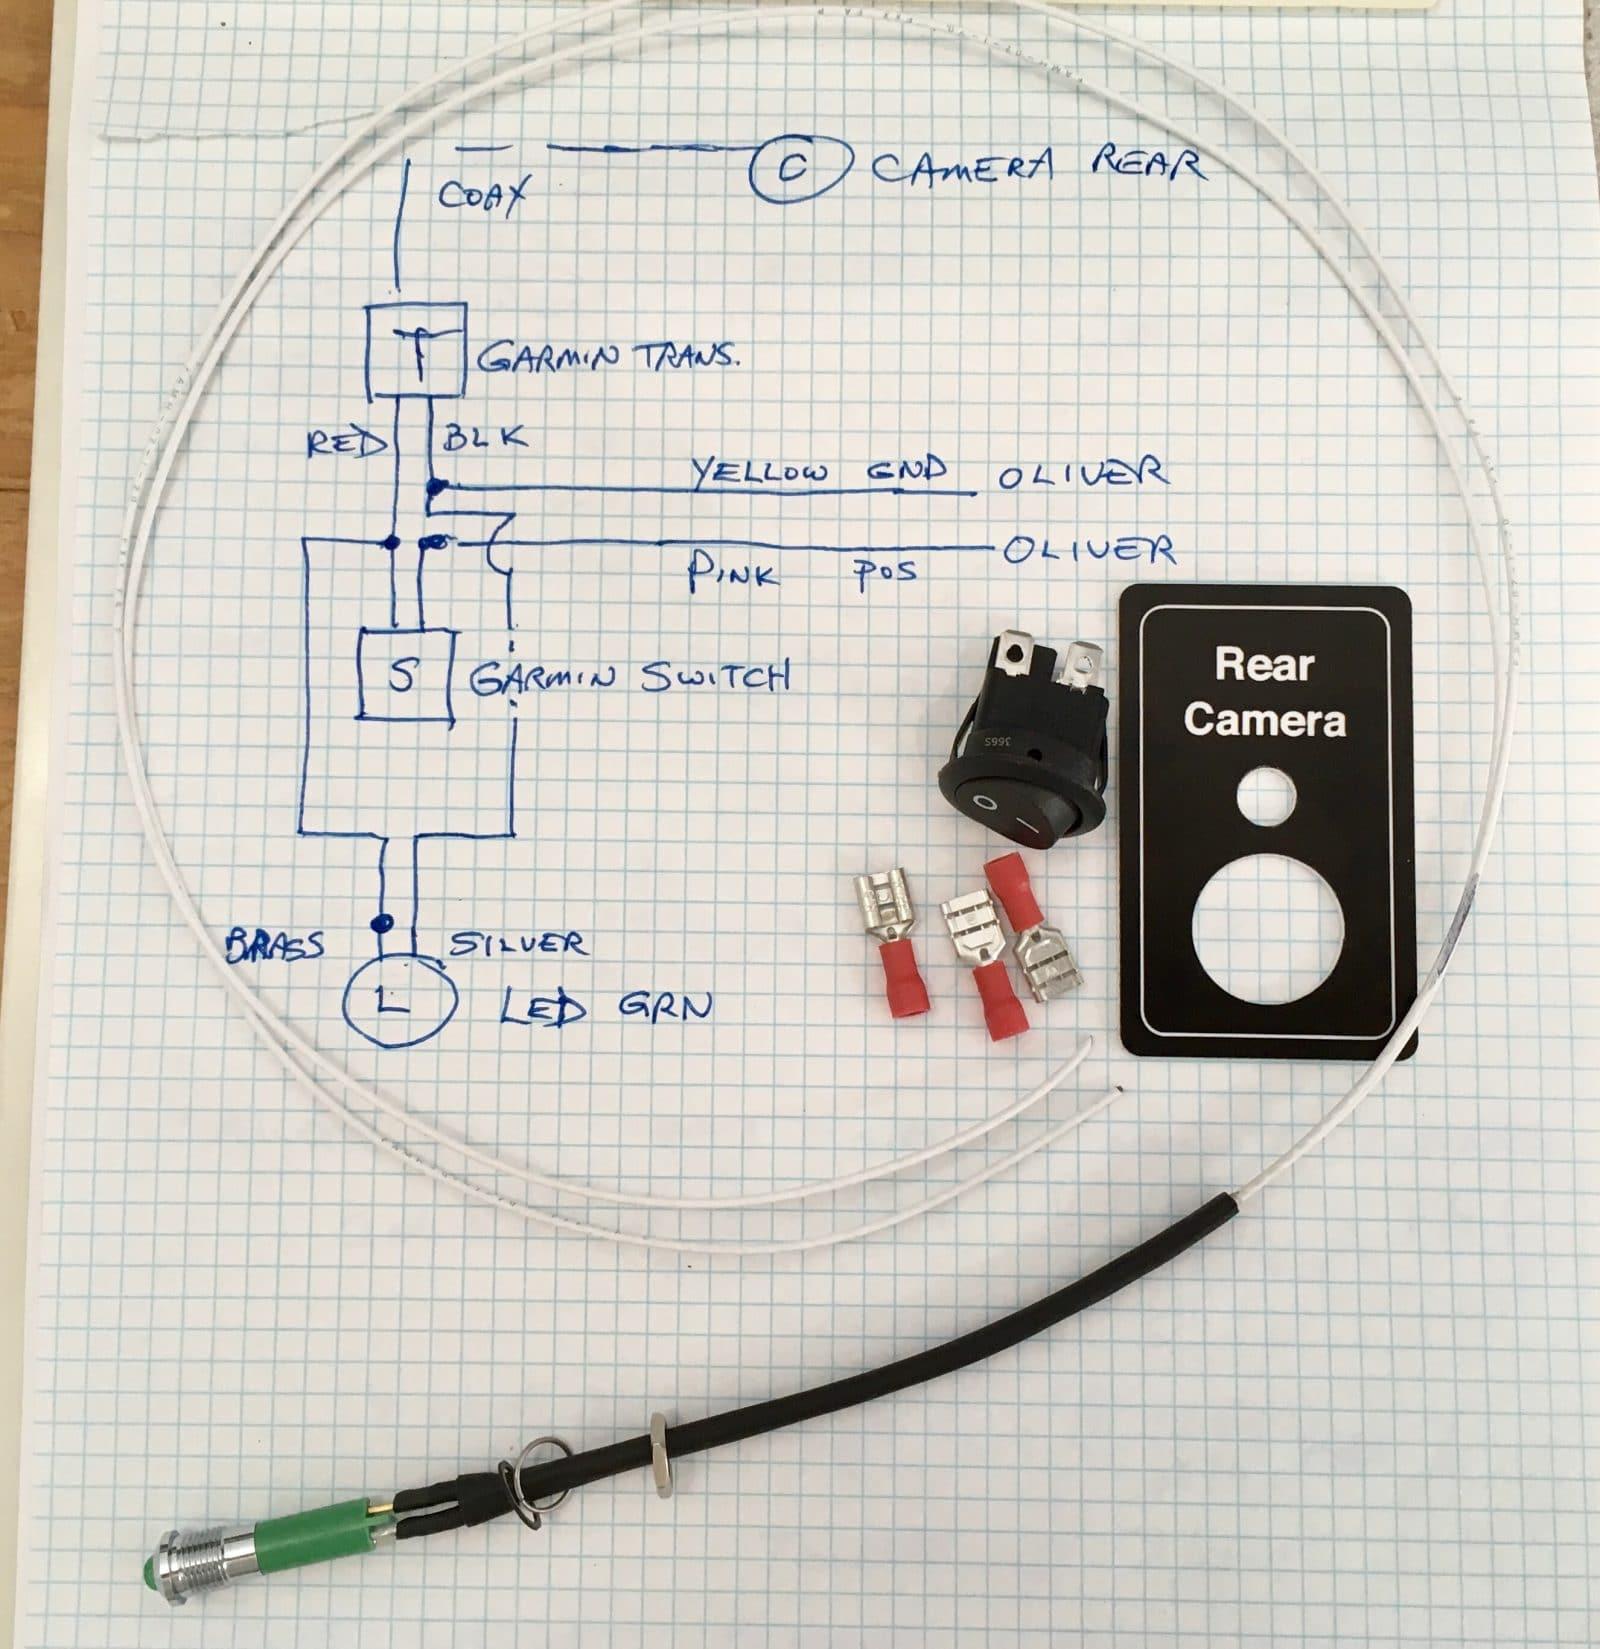 Wiring Diagram Garmin Etrex 30